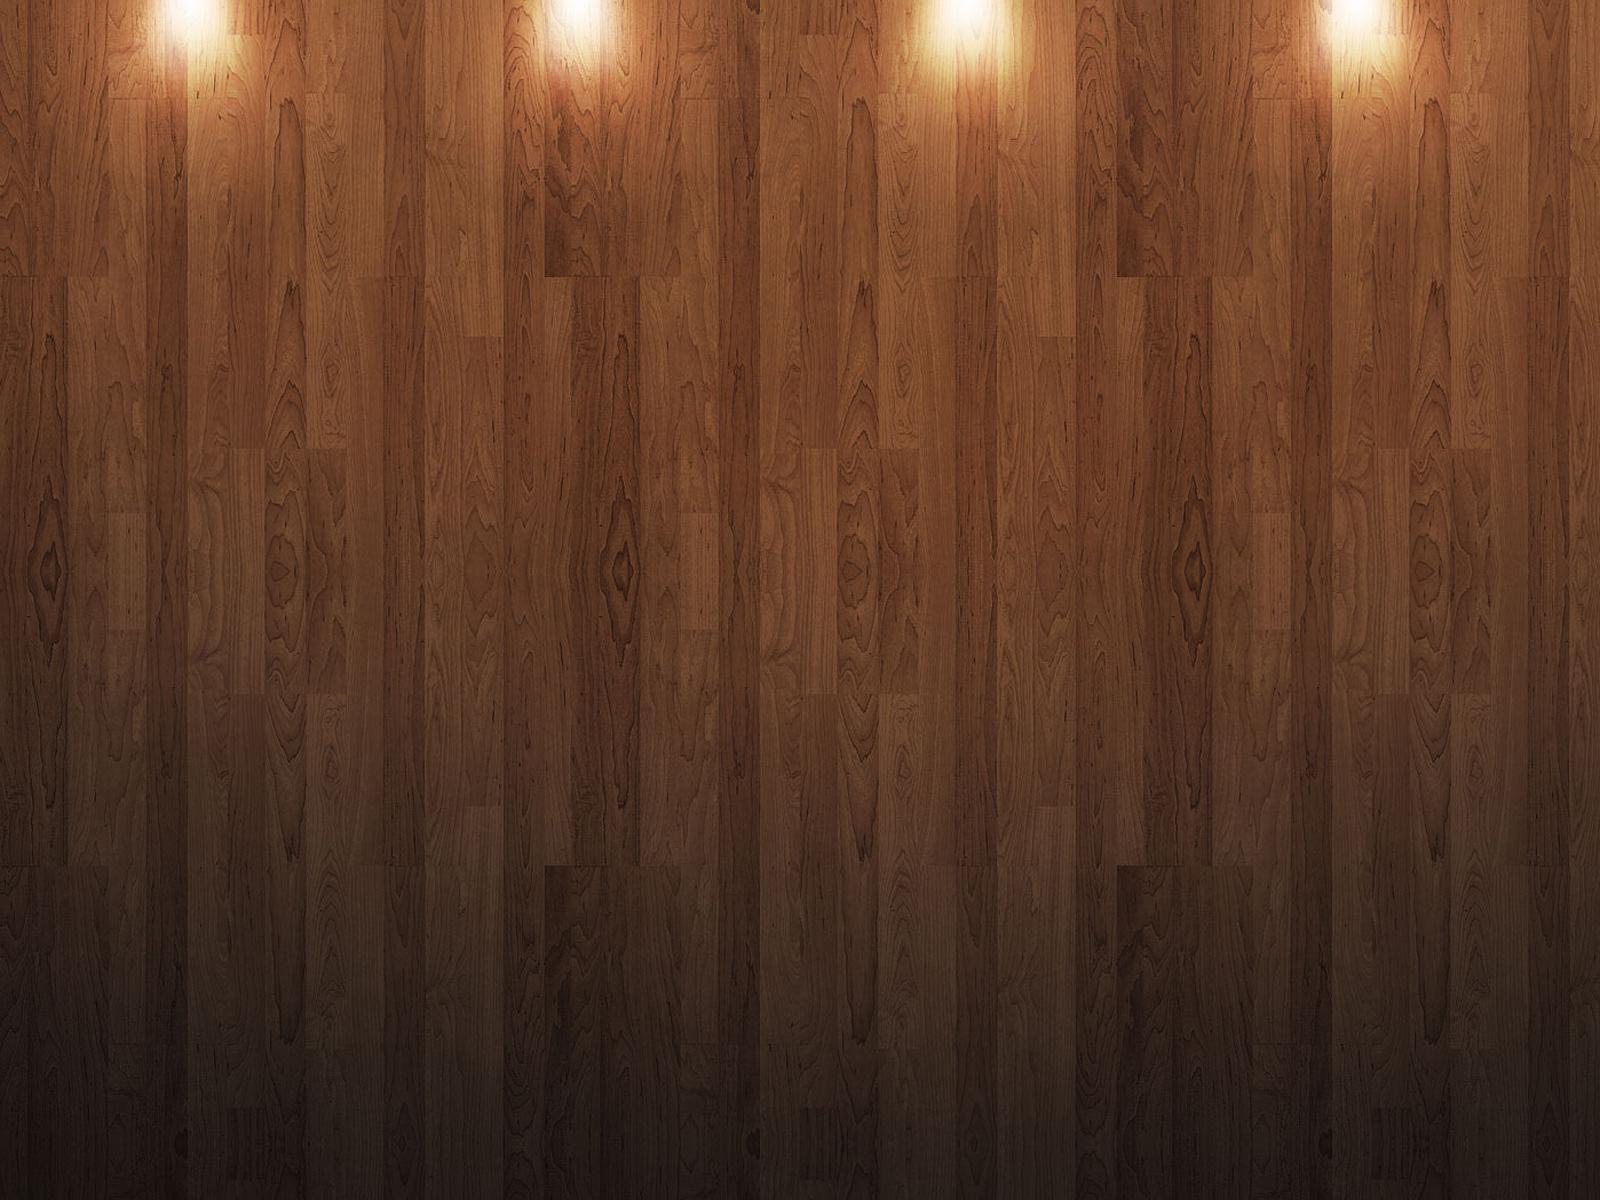 Fond d'ecran Mur en bois - Wallpaper